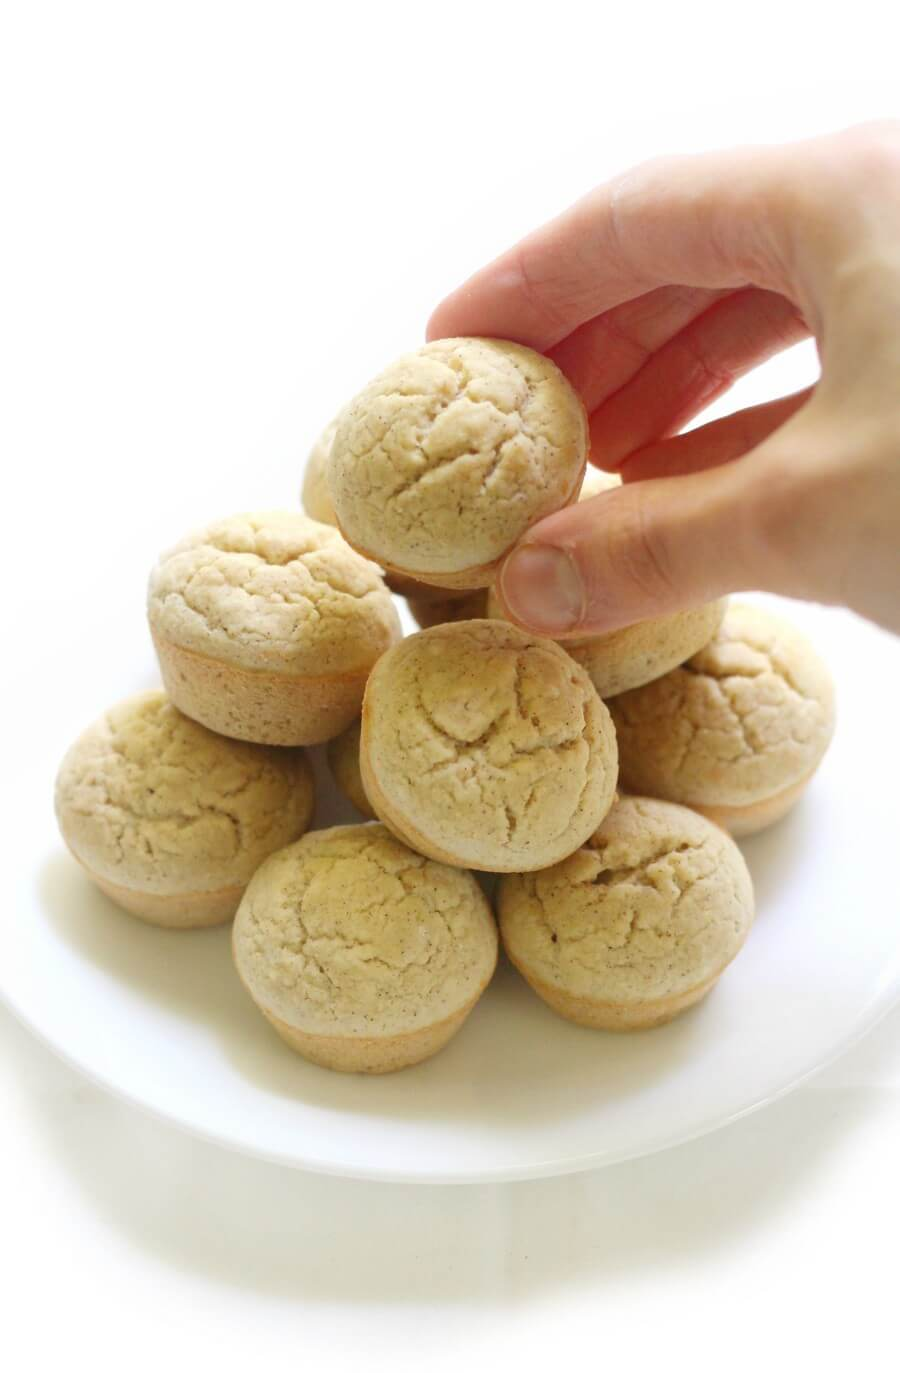 hand grabbing a gluten-free applesauce muffin from white plate